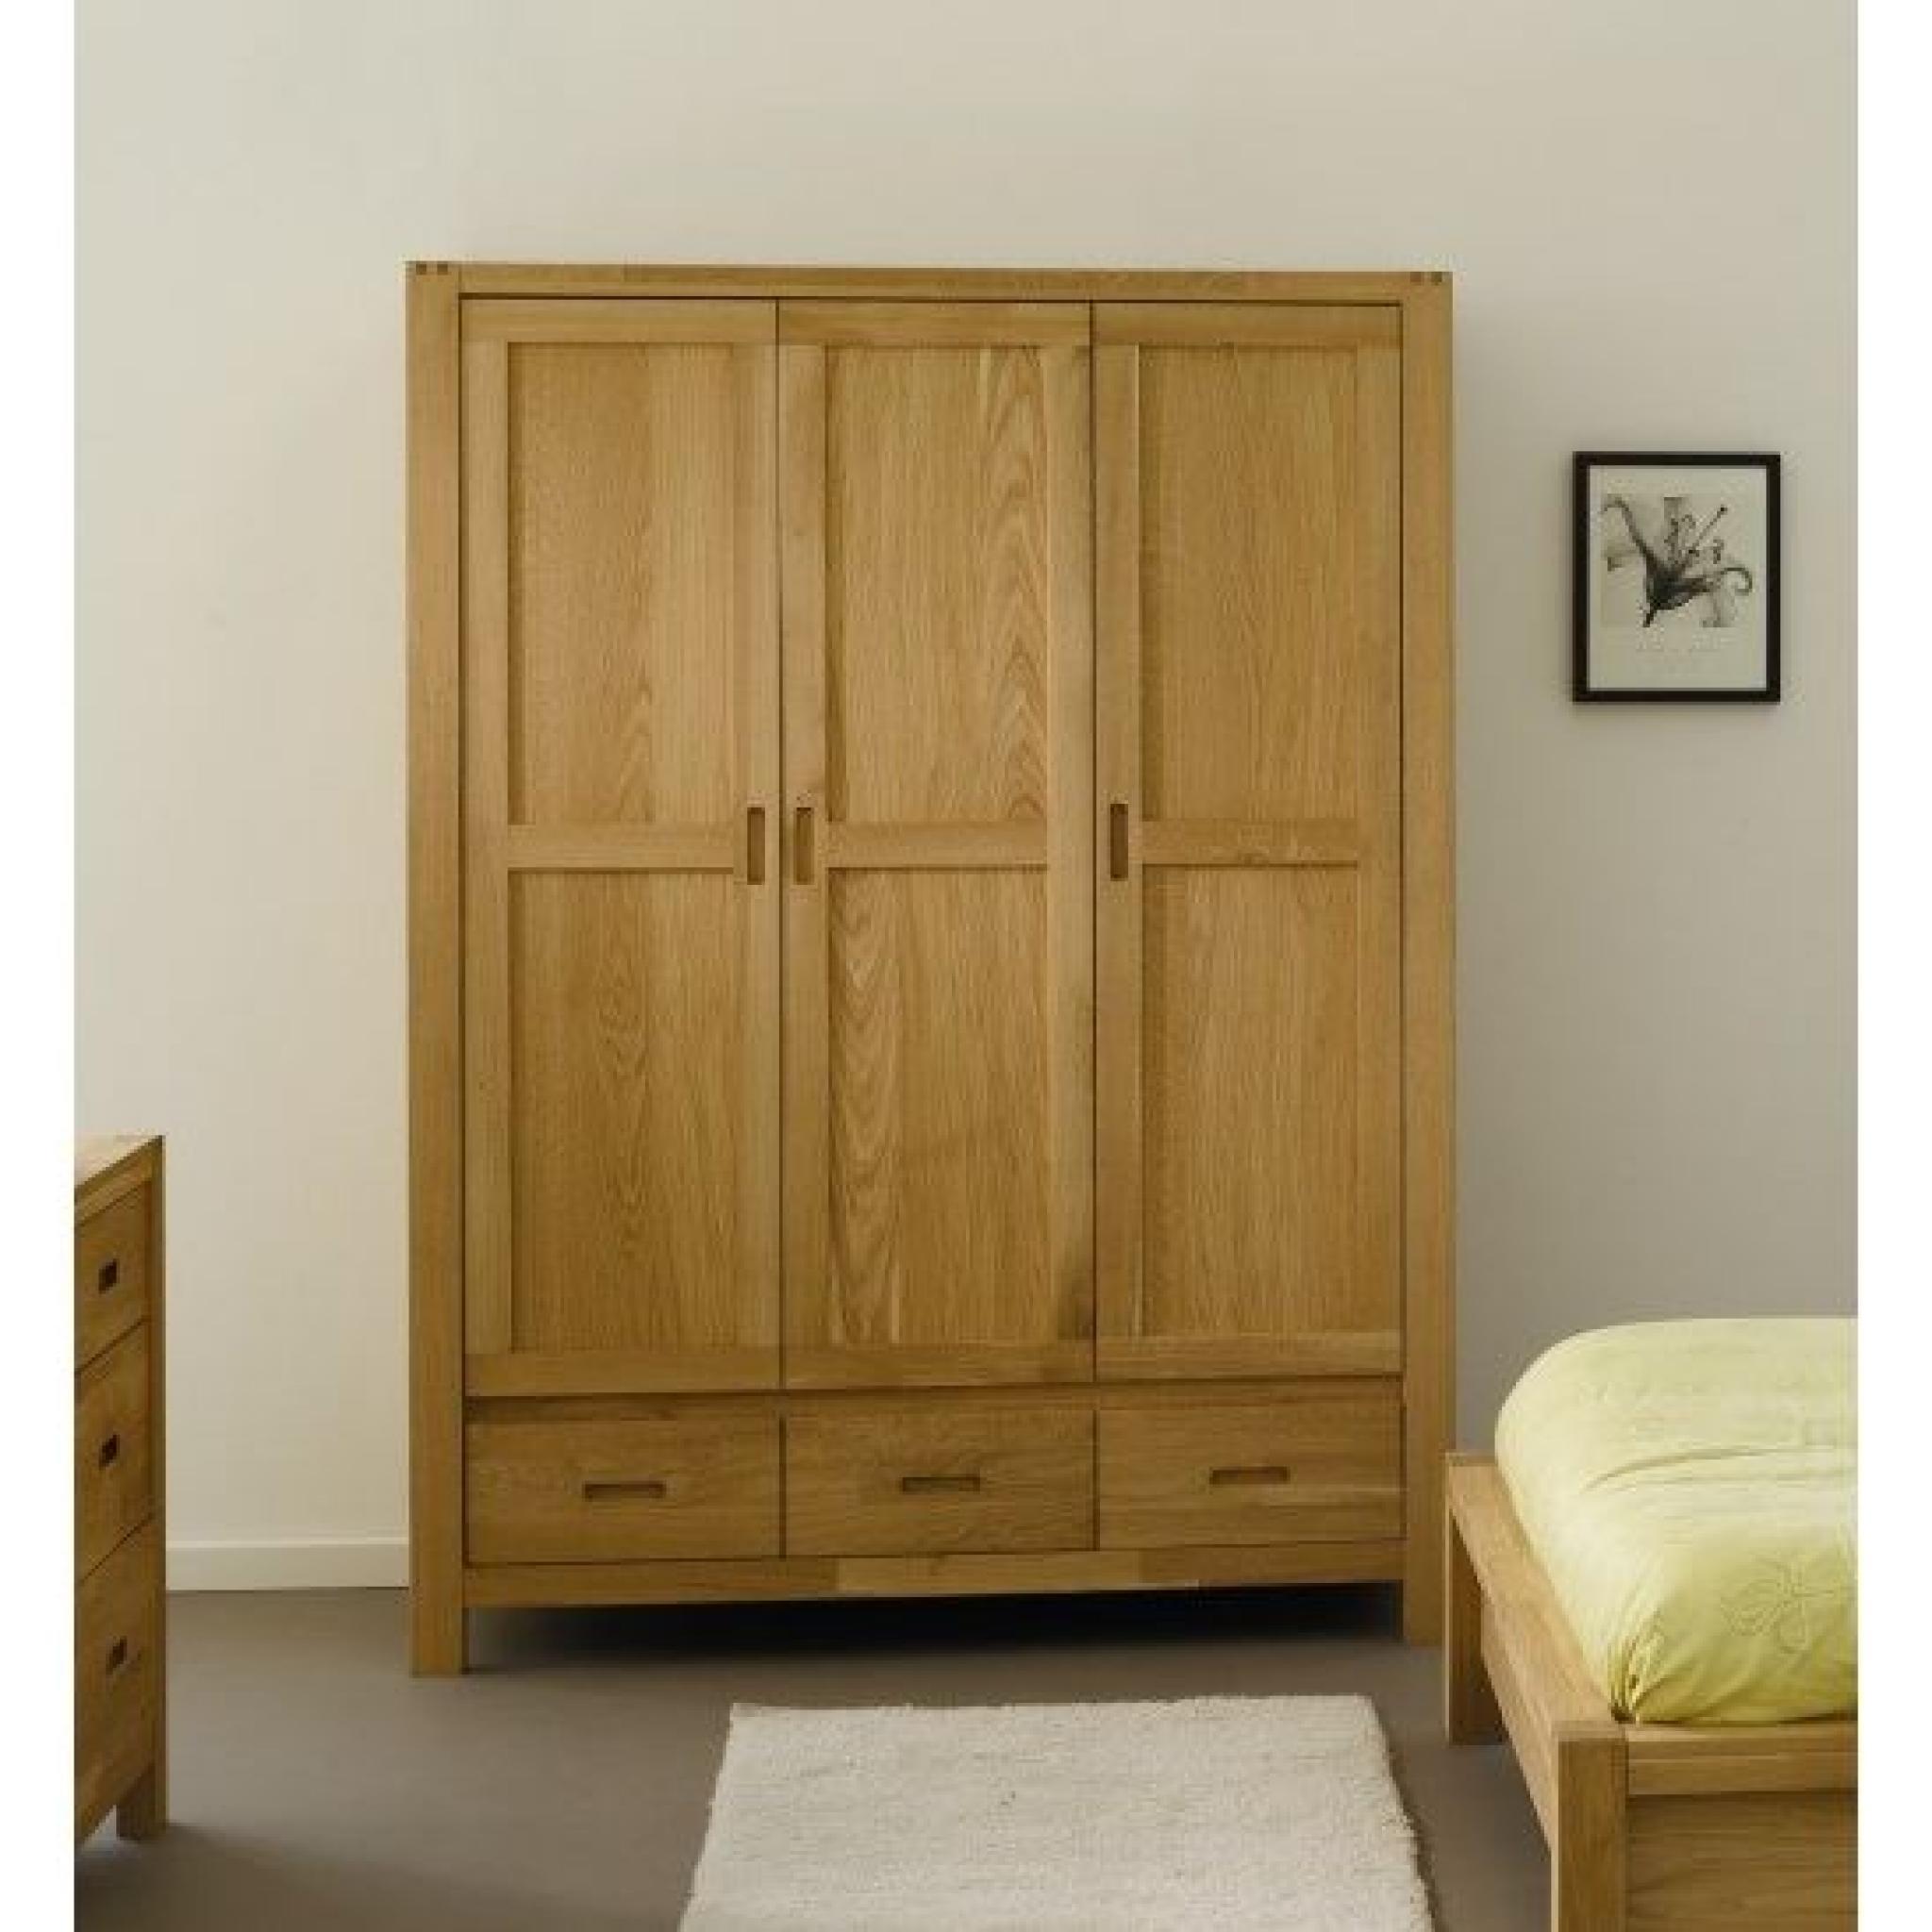 NATHAN Armoire 3 portes en chêne massif - Achat/Vente armoire de ...